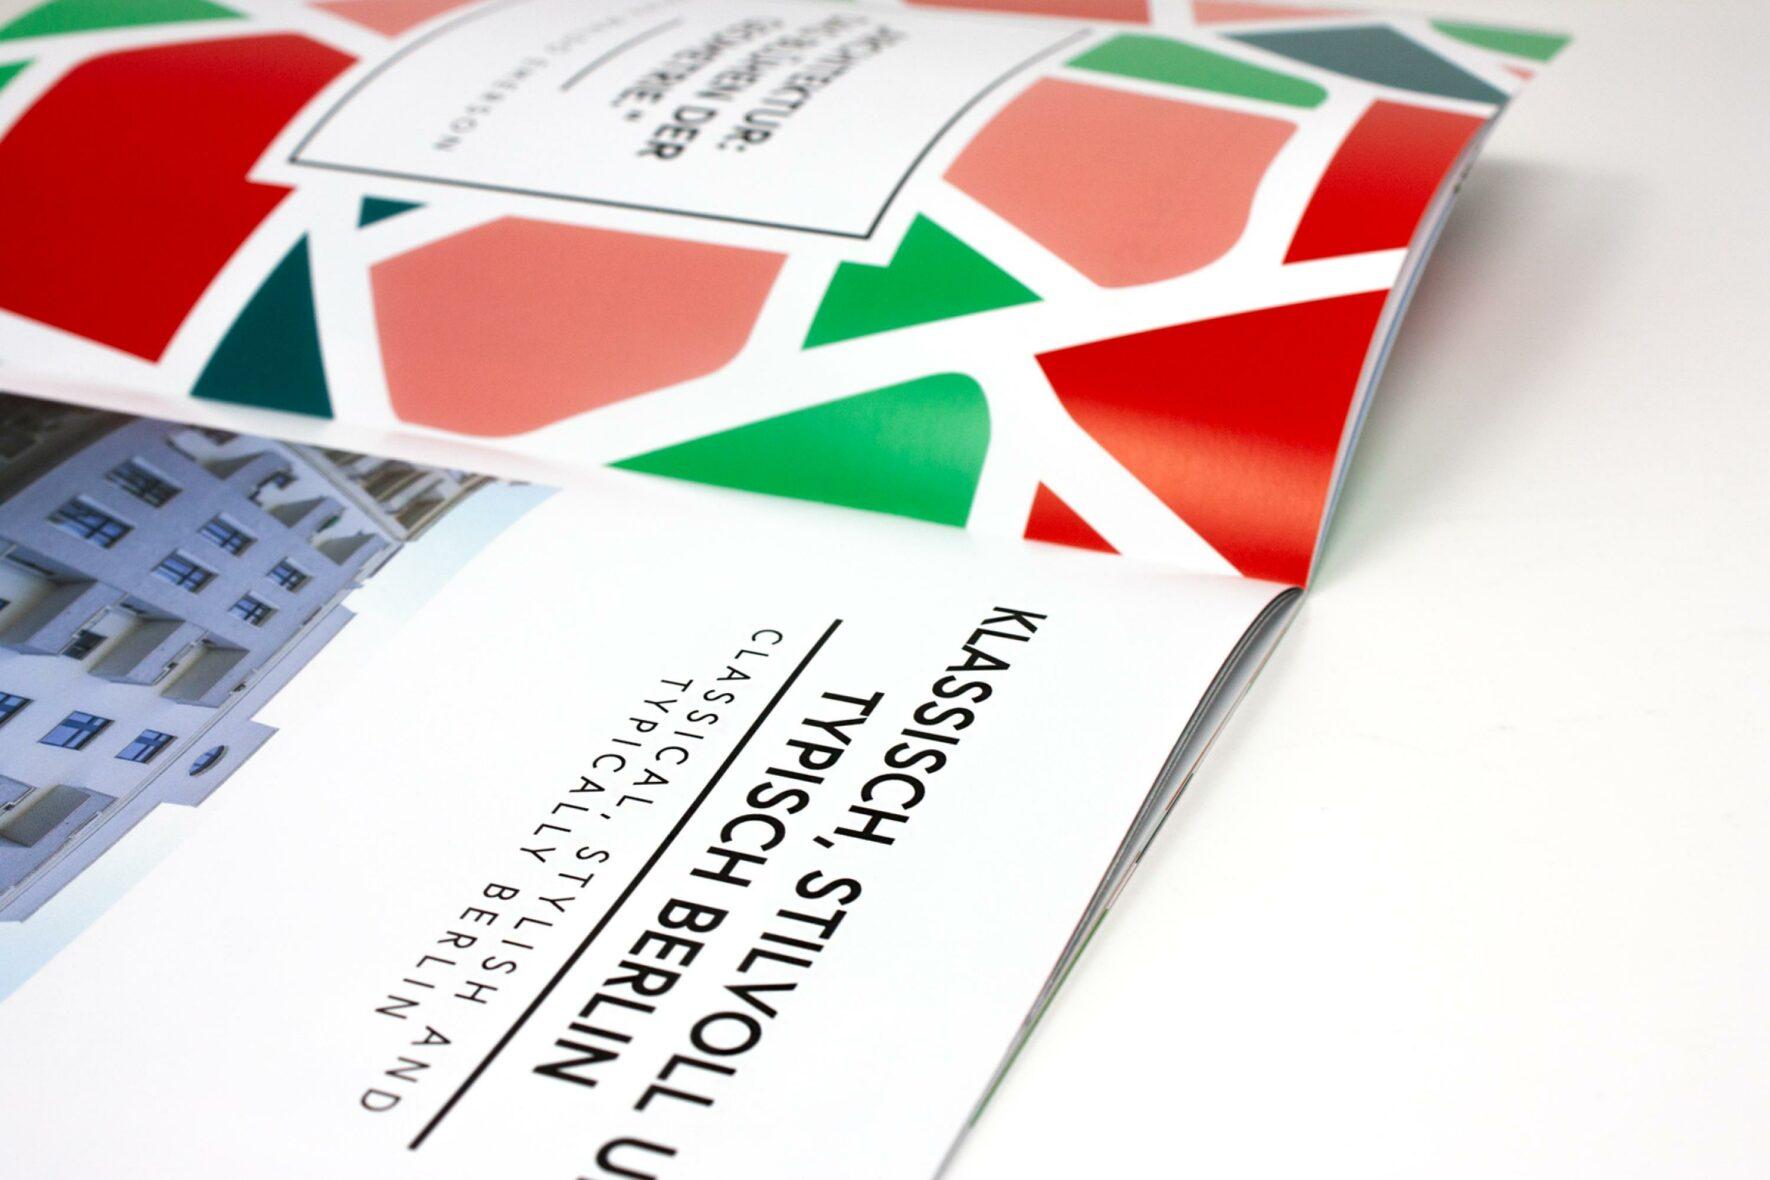 Broschuere-Osloer-Immobilienbranding-Trendcity-FORMLOS-berlin-93